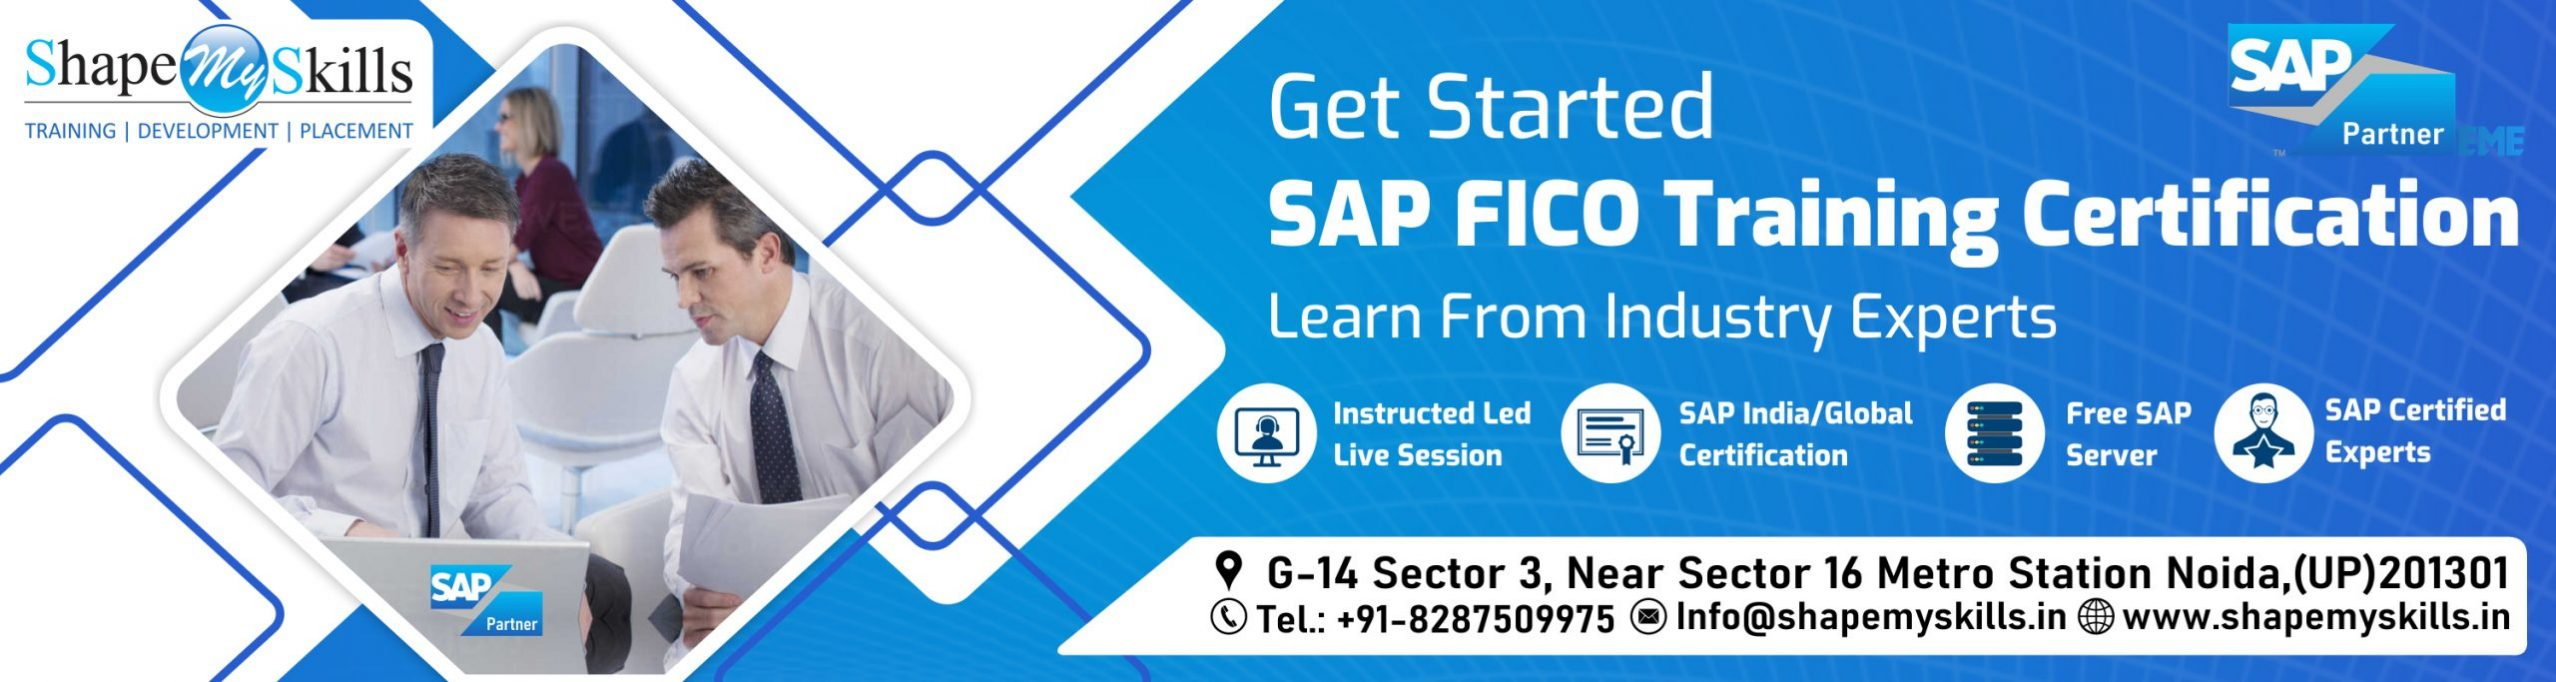 SAP FICO TRAINING IN DELHI/NCR